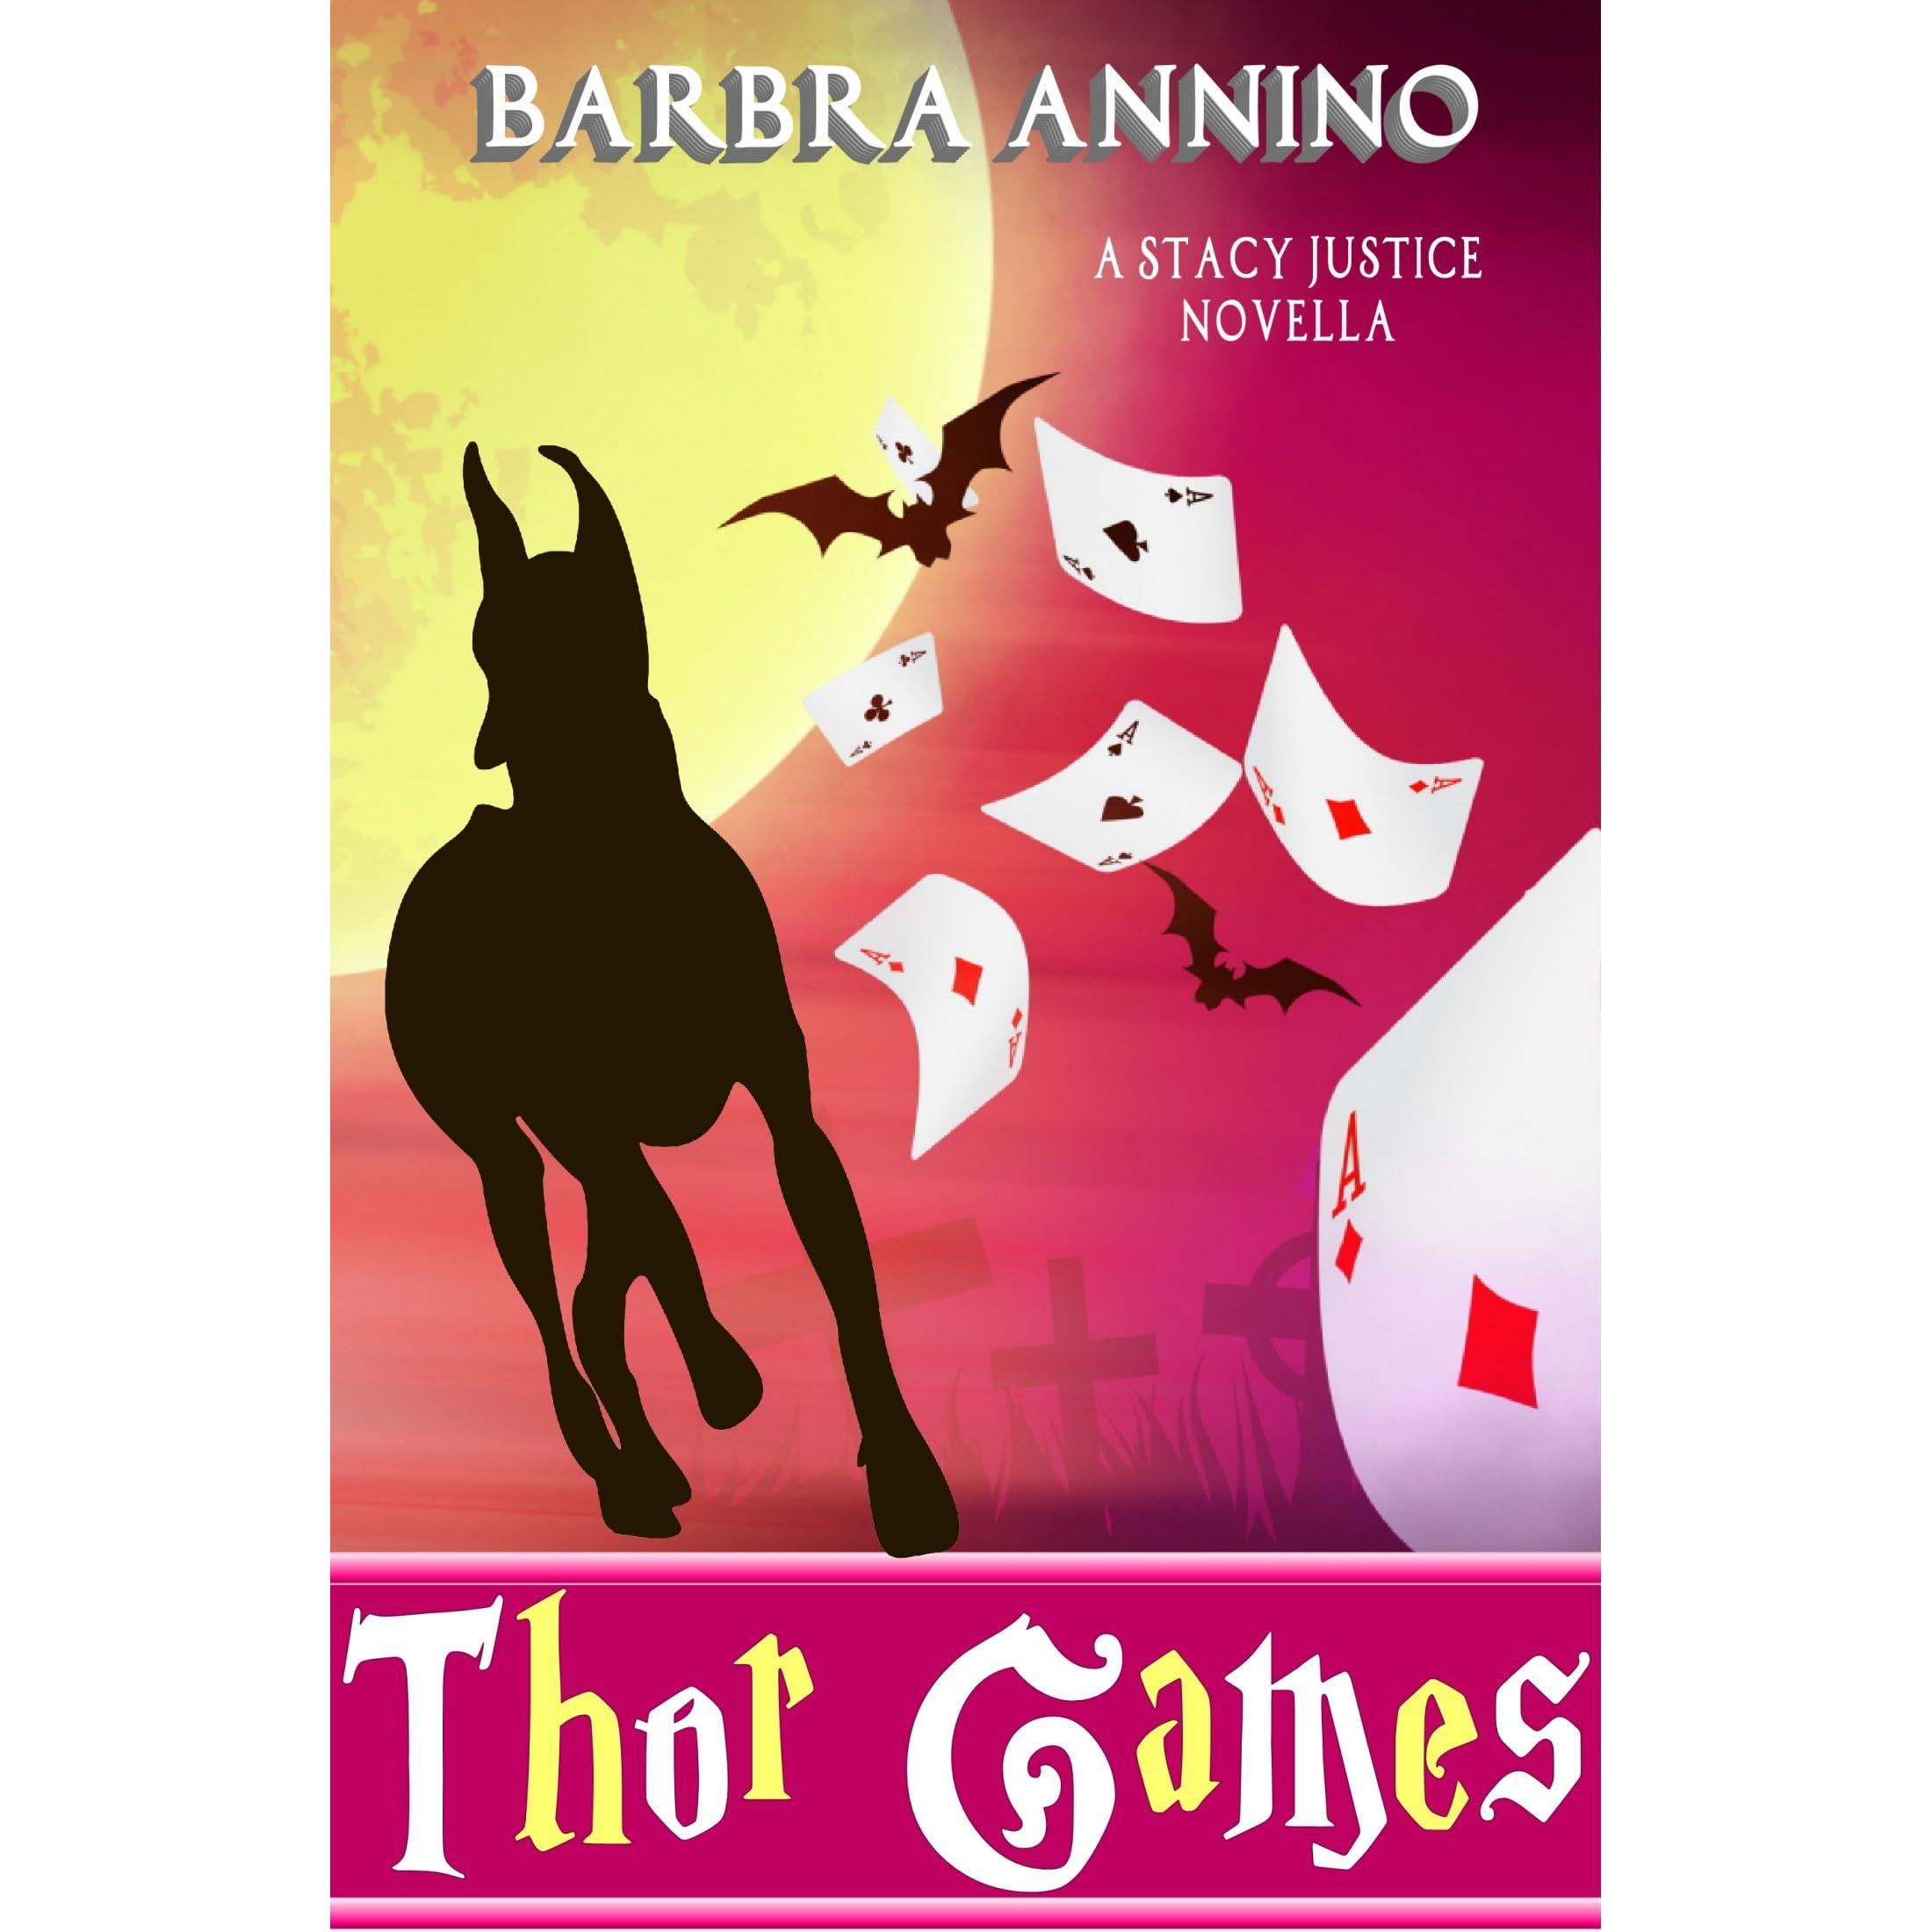 Thor Games By Barbra Annino